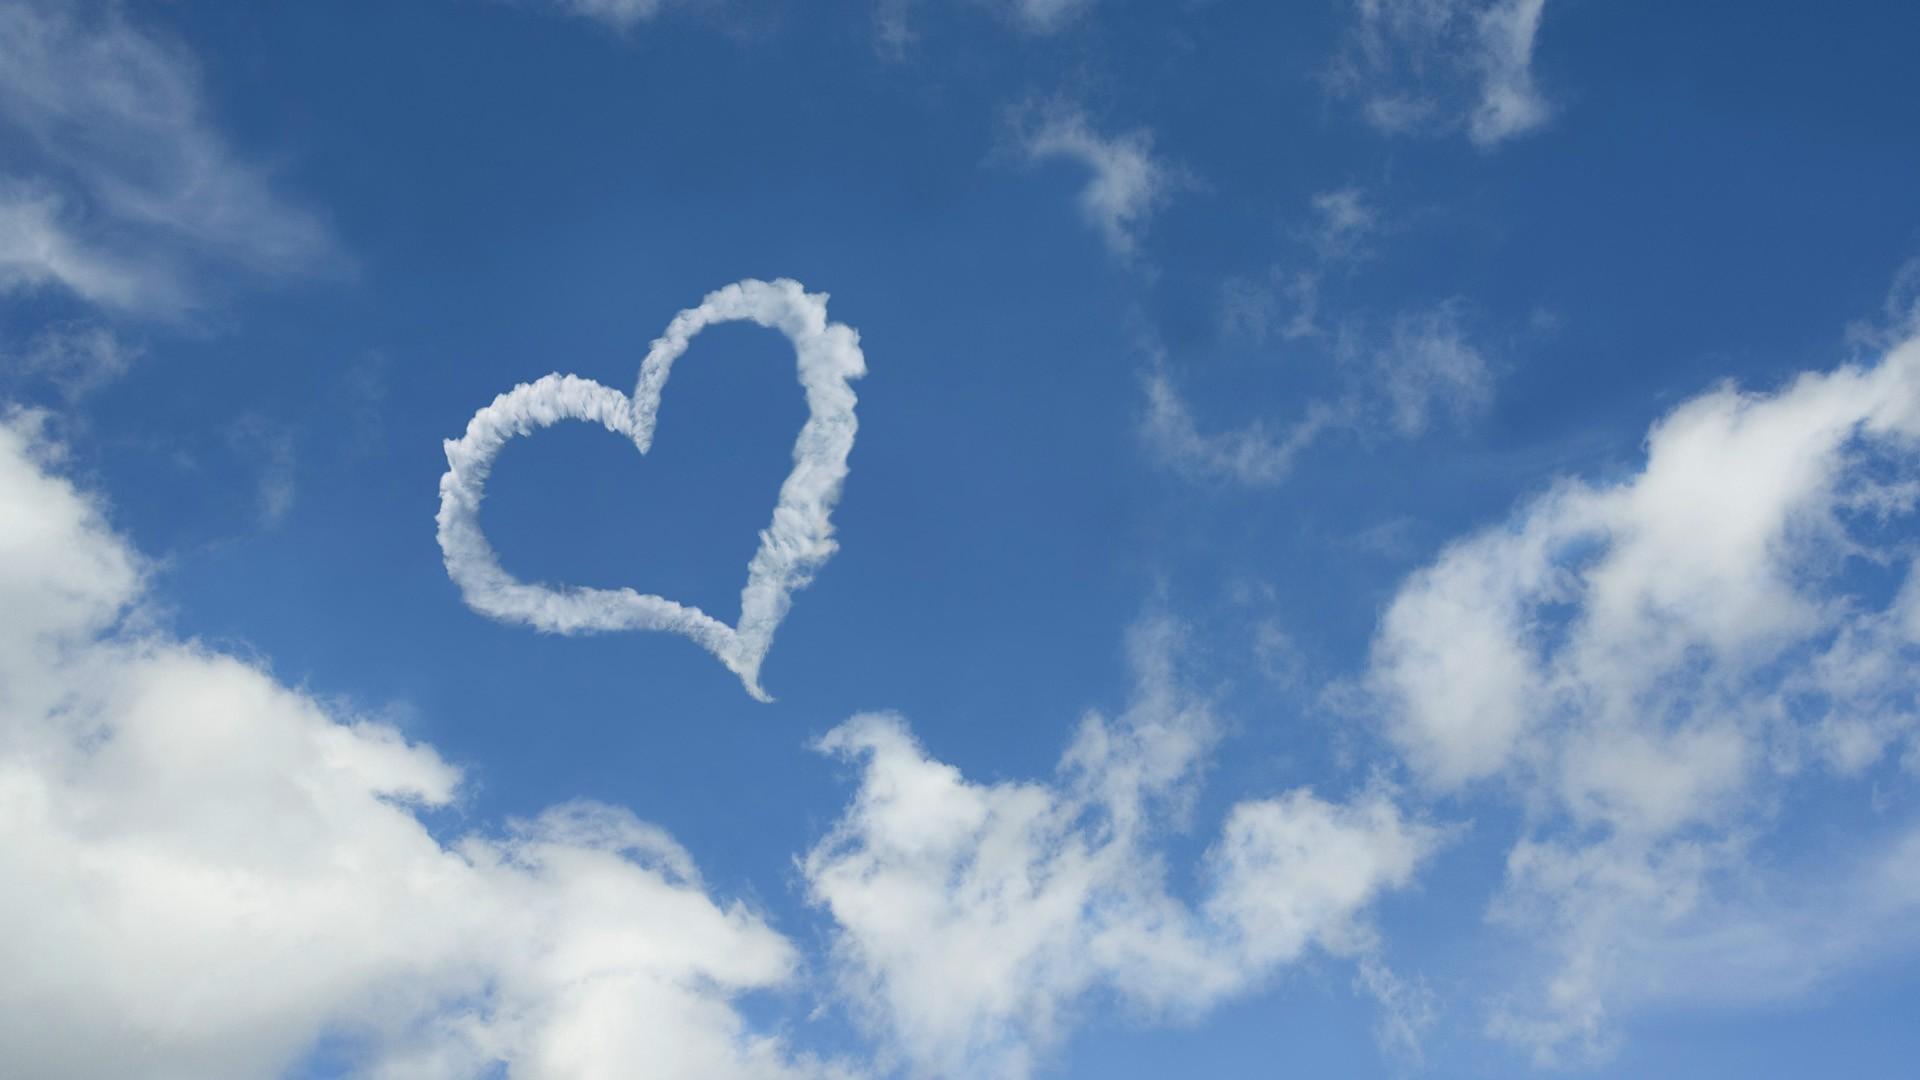 """Cloud Wallpaper"" was added on 16 Jun 2012. [ Hot HD Wallpaper ]"